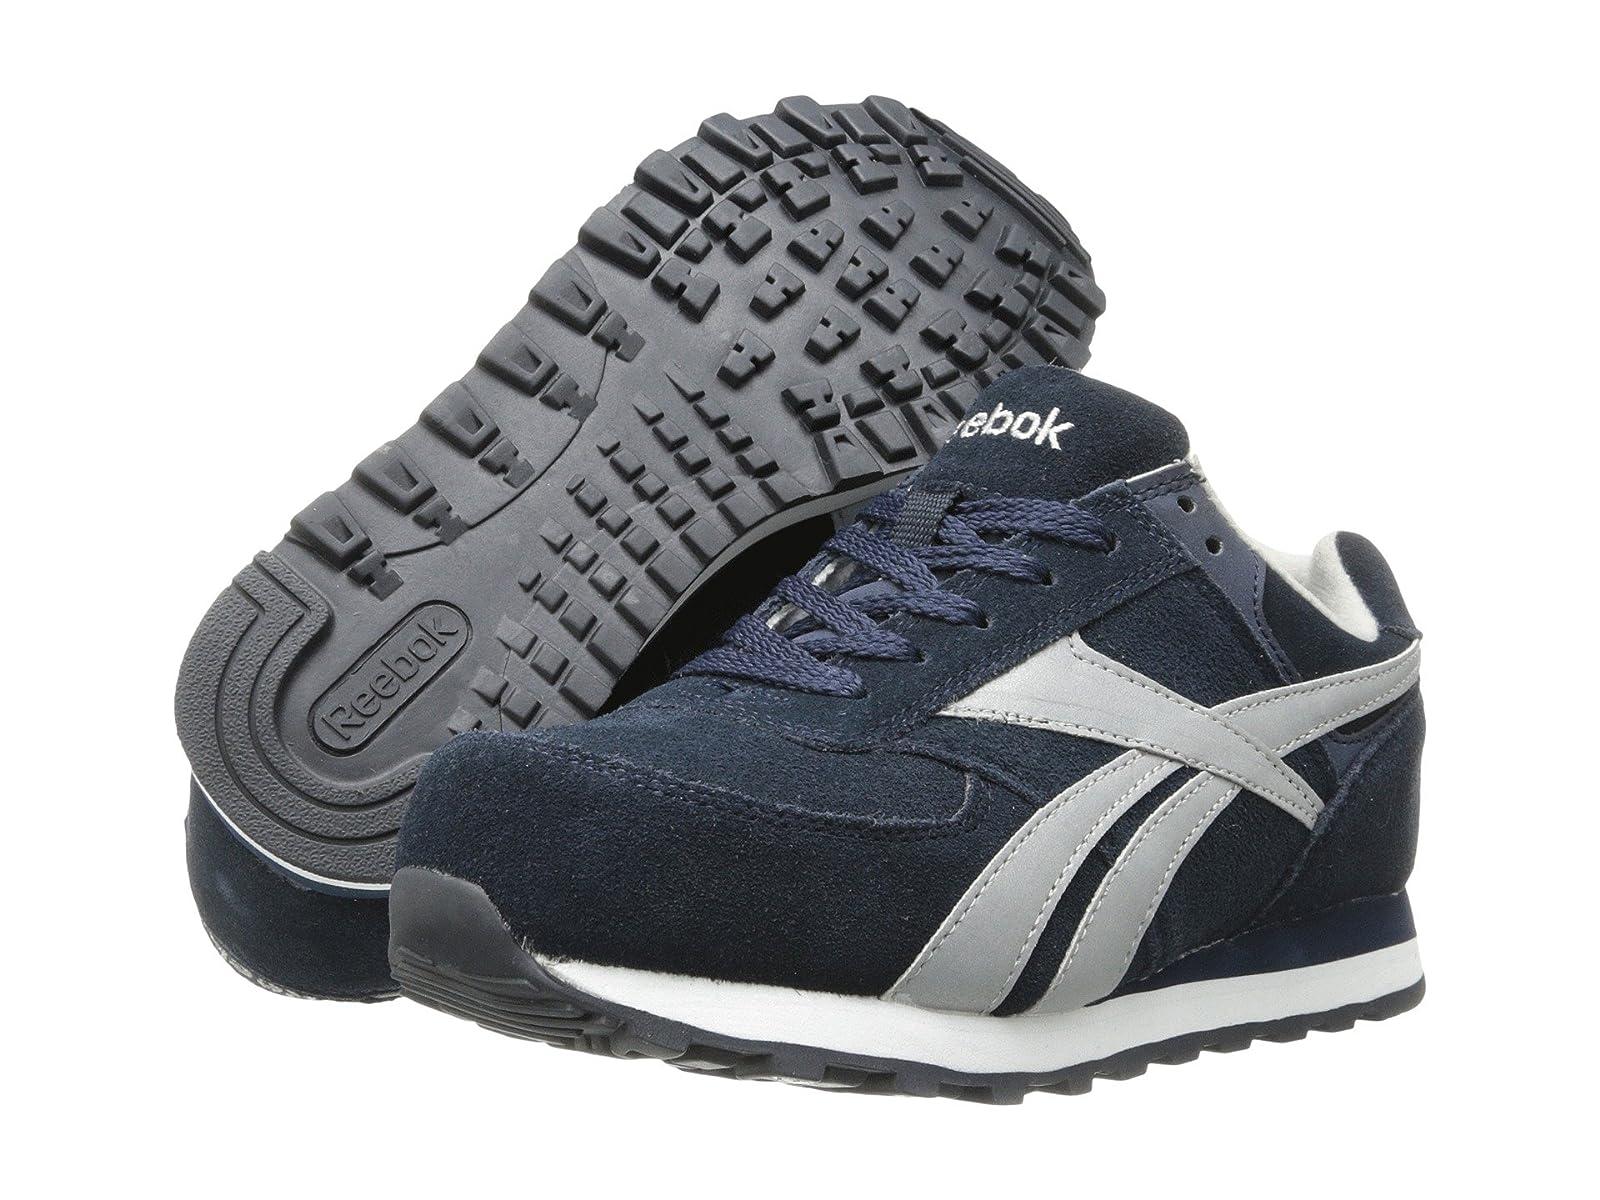 Reebok Work LeelapAtmospheric grades have affordable shoes